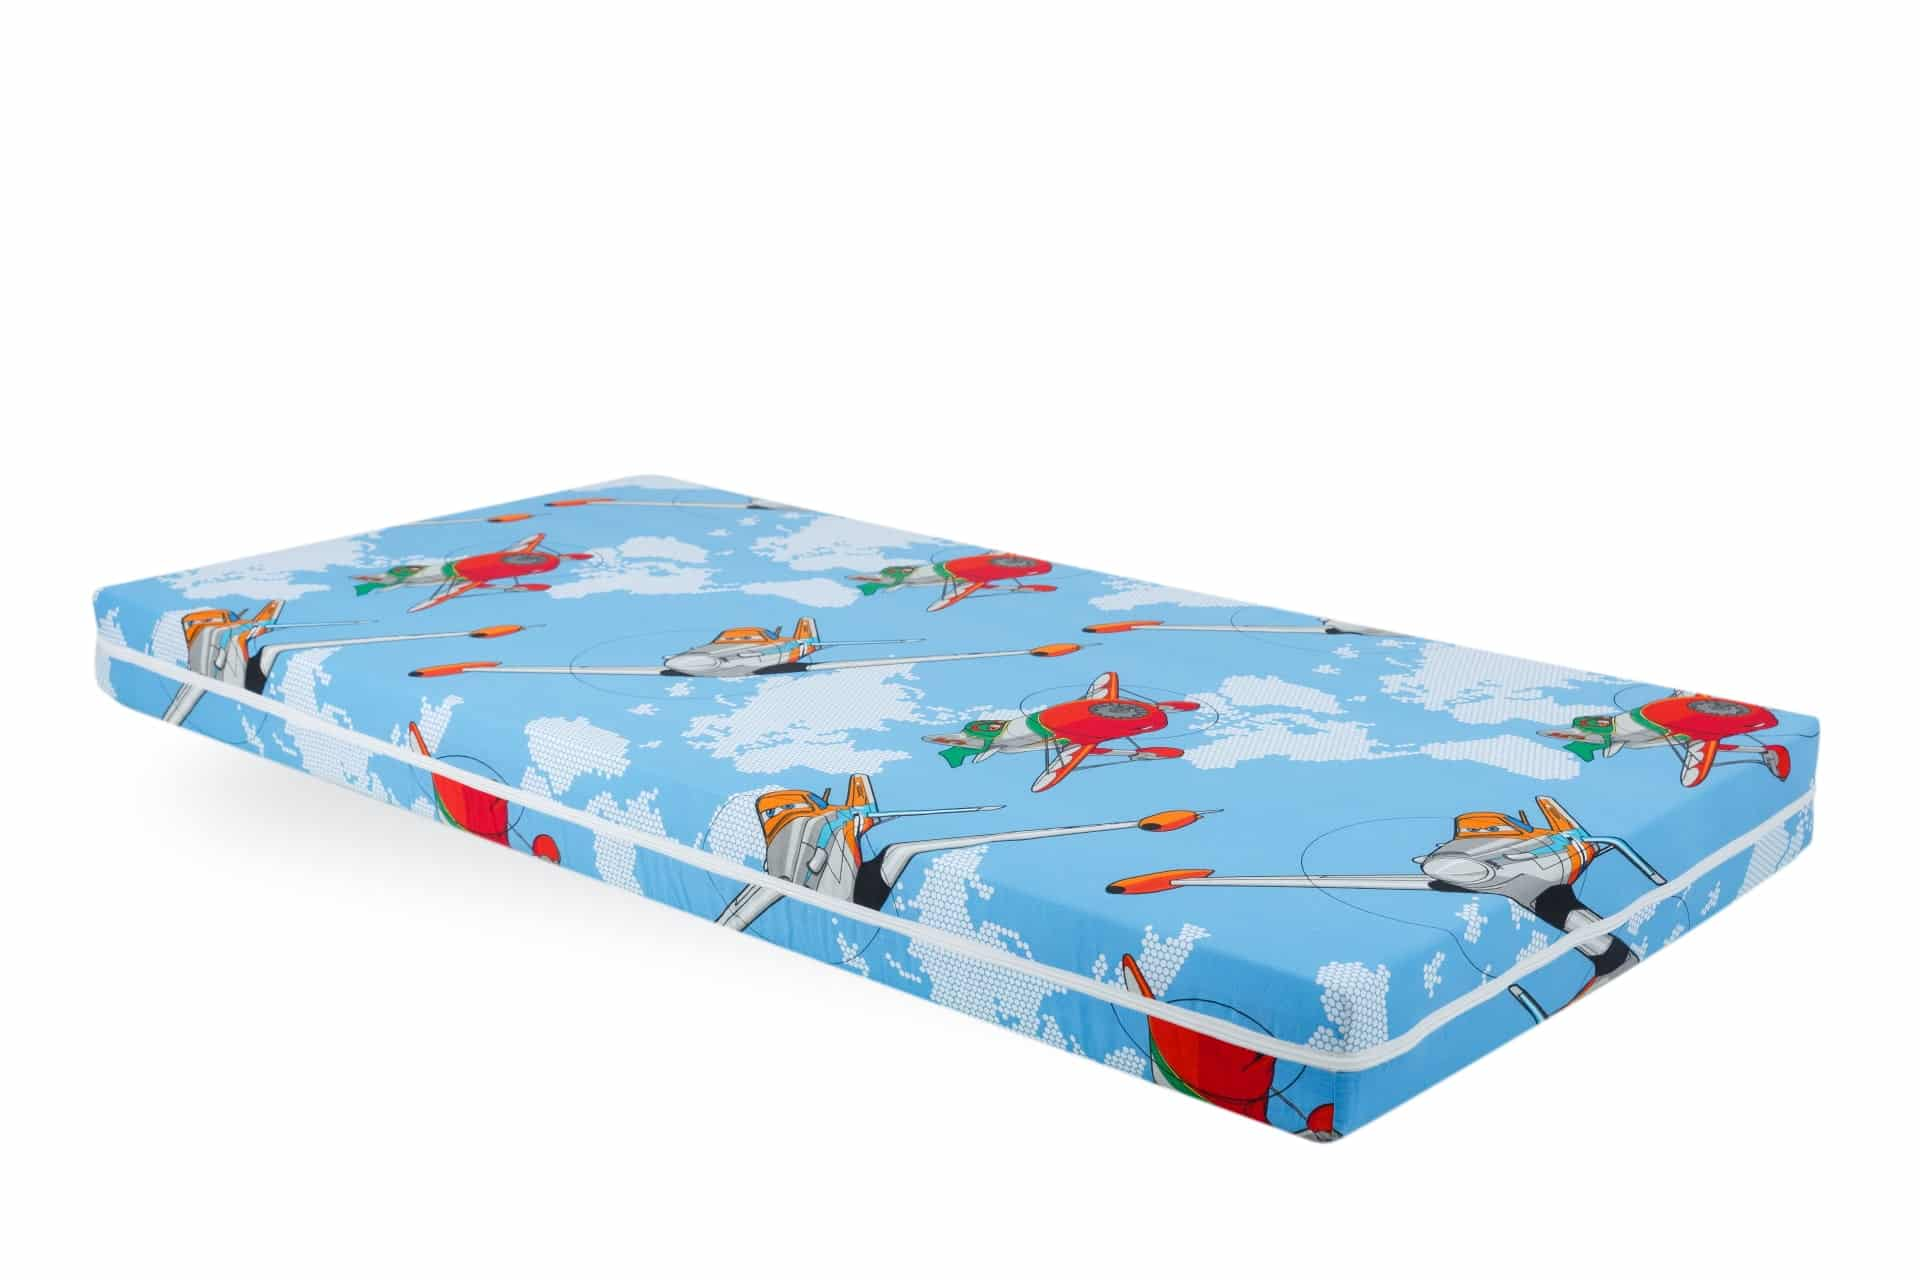 Saltea Pat Somnart Memory cu husa protectie impermeabila pentru bebelusi si copii model Aviator 70x140 poza somnart.ro